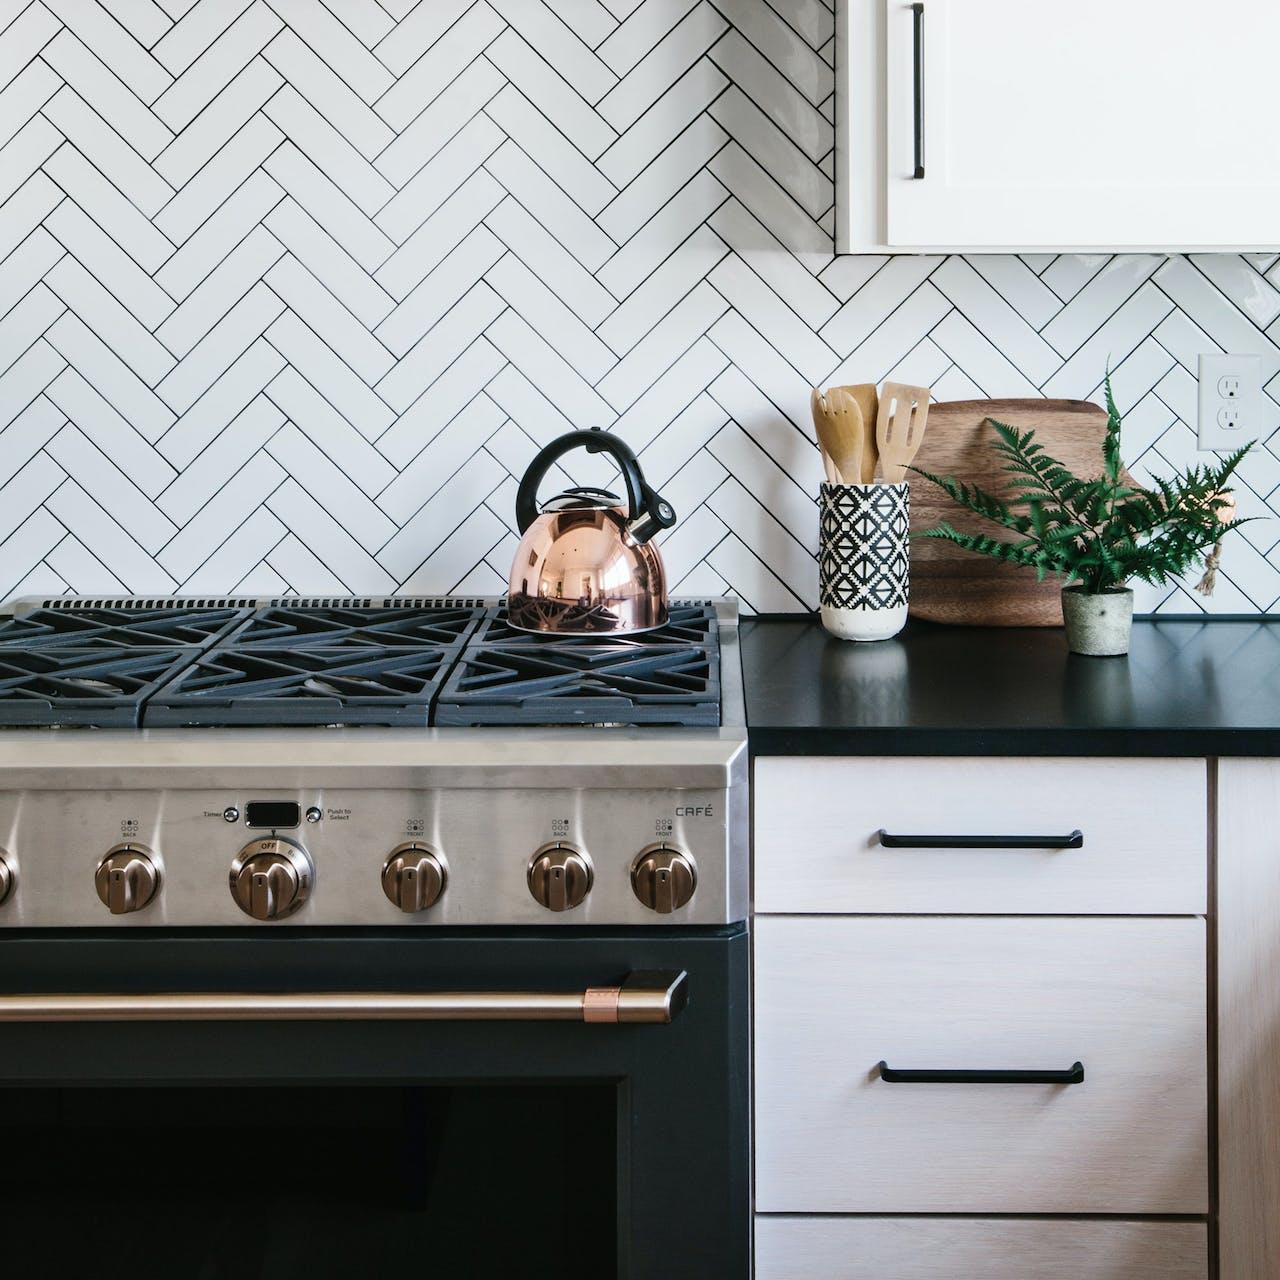 herringbone tile backsplash behind Cafe pro range